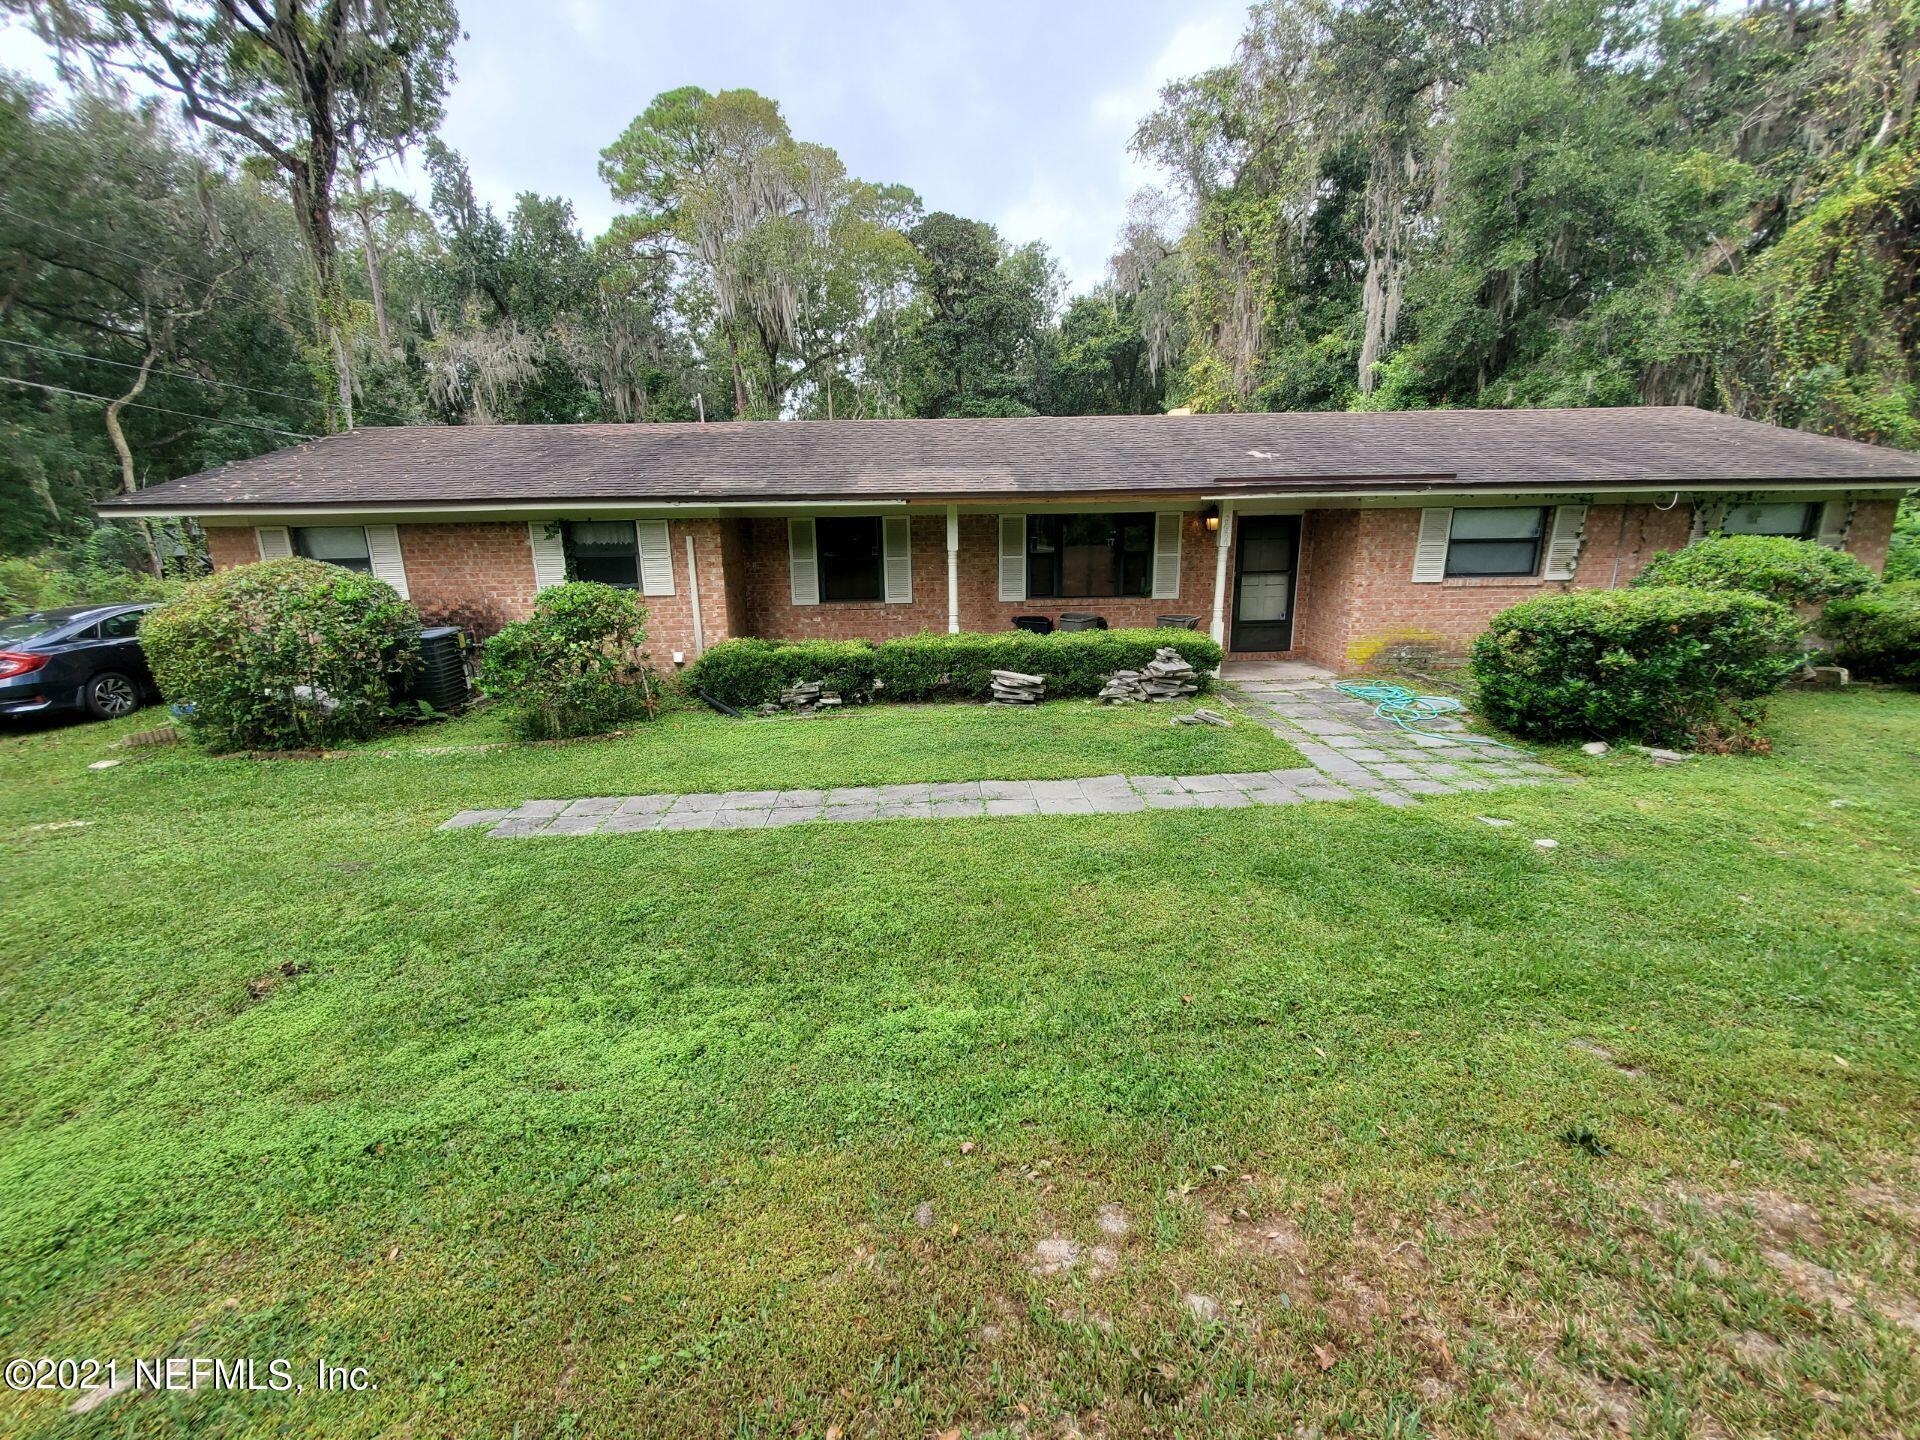 5092 HARVEY GRANT, ORANGE PARK, FLORIDA 32003, 3 Bedrooms Bedrooms, ,2 BathroomsBathrooms,Residential,For sale,HARVEY GRANT,1136745